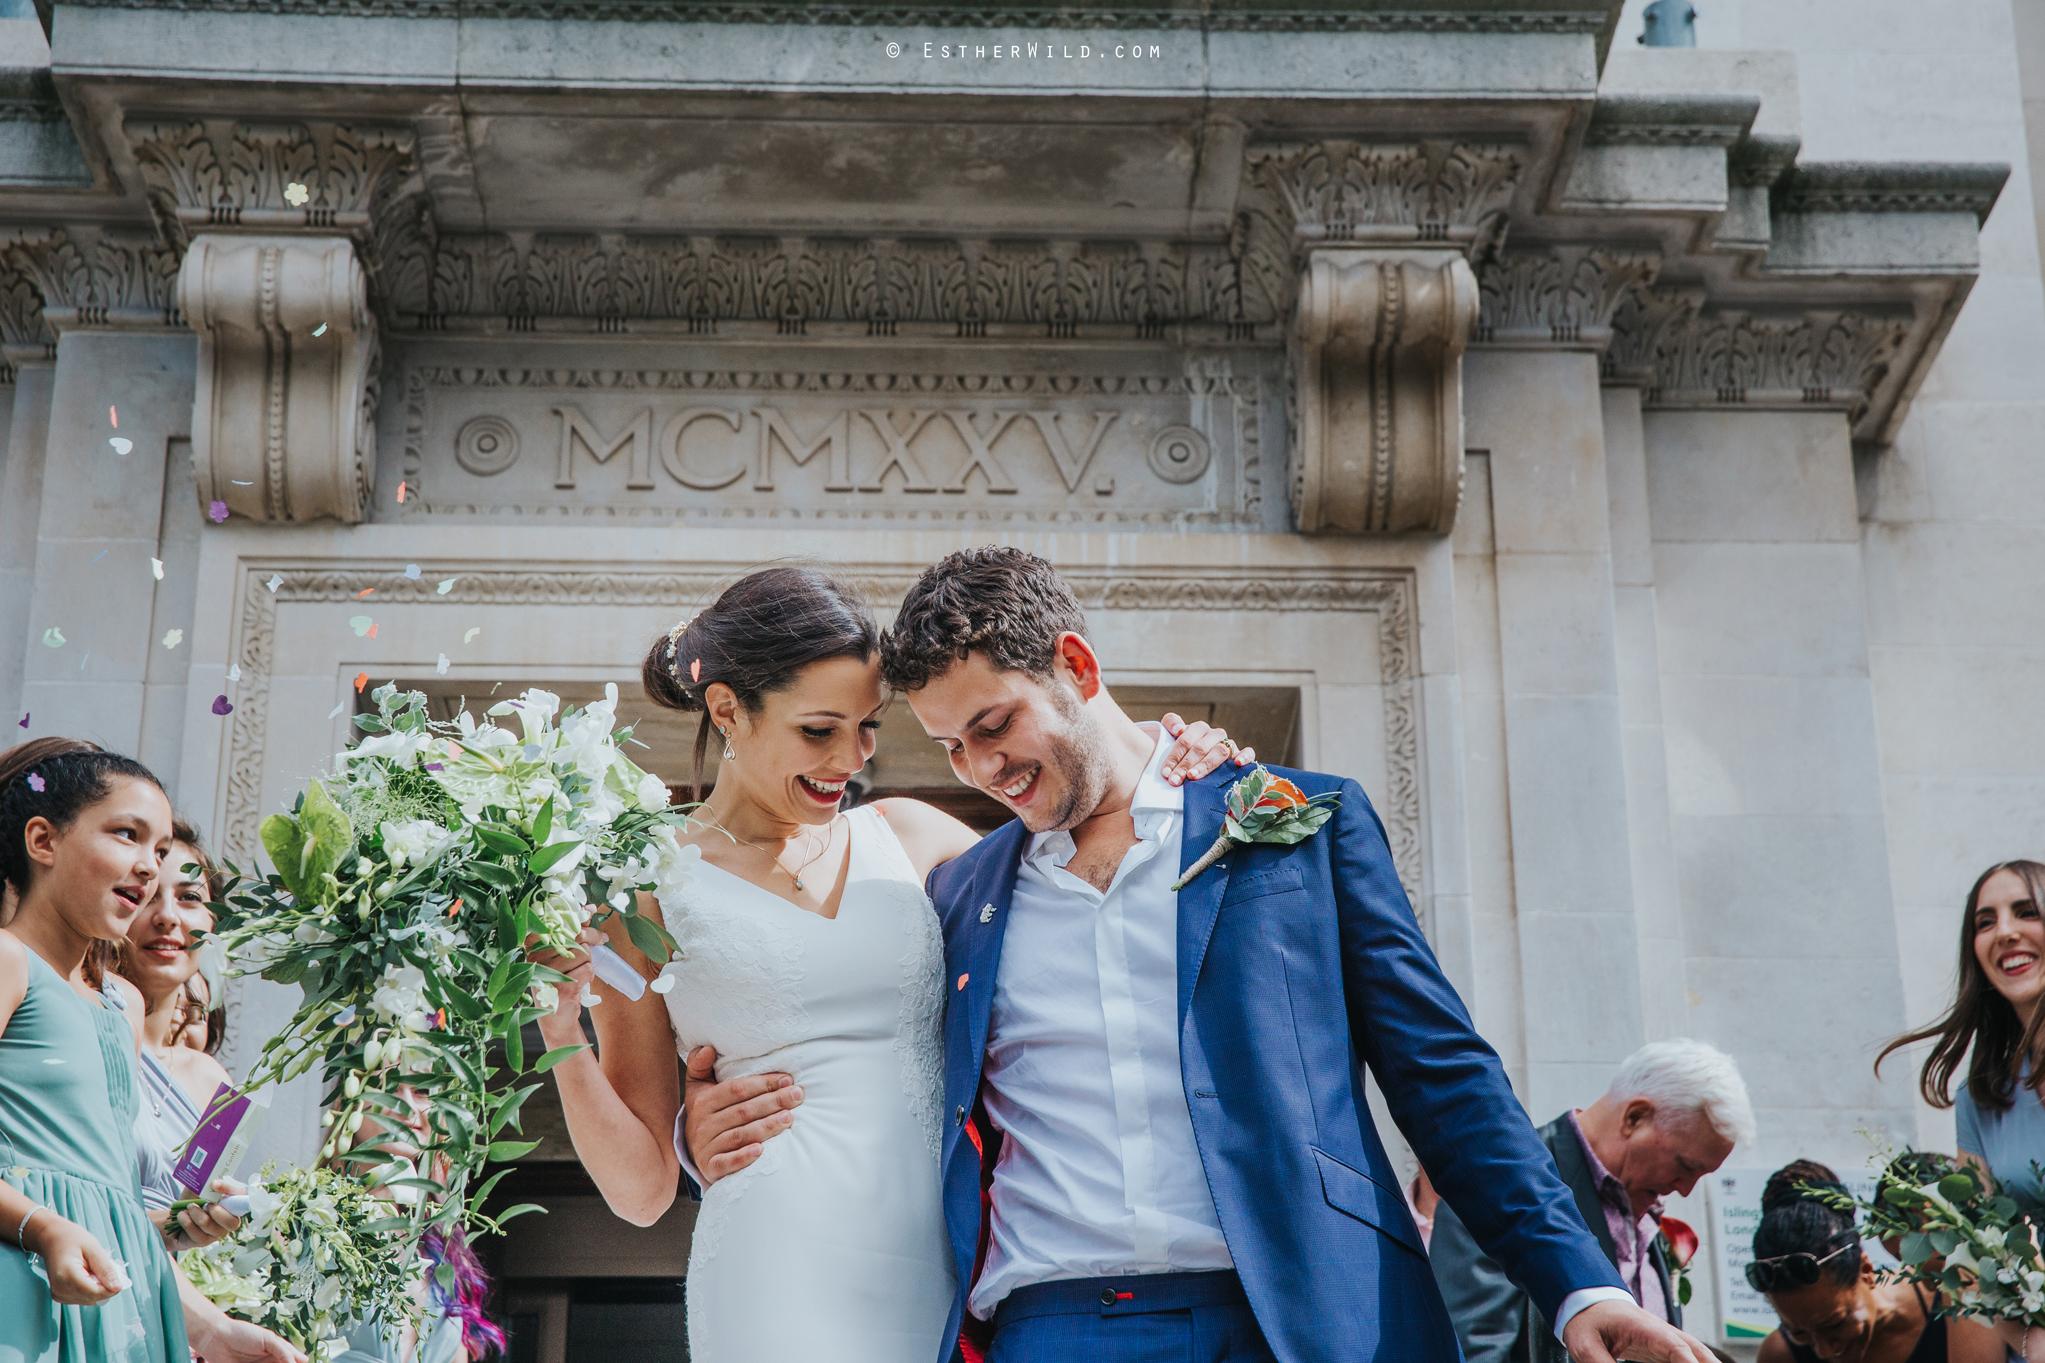 Islington_Town_Hall_Wedding_London_Photographer_Esther_Wild_IMG_5246.jpg